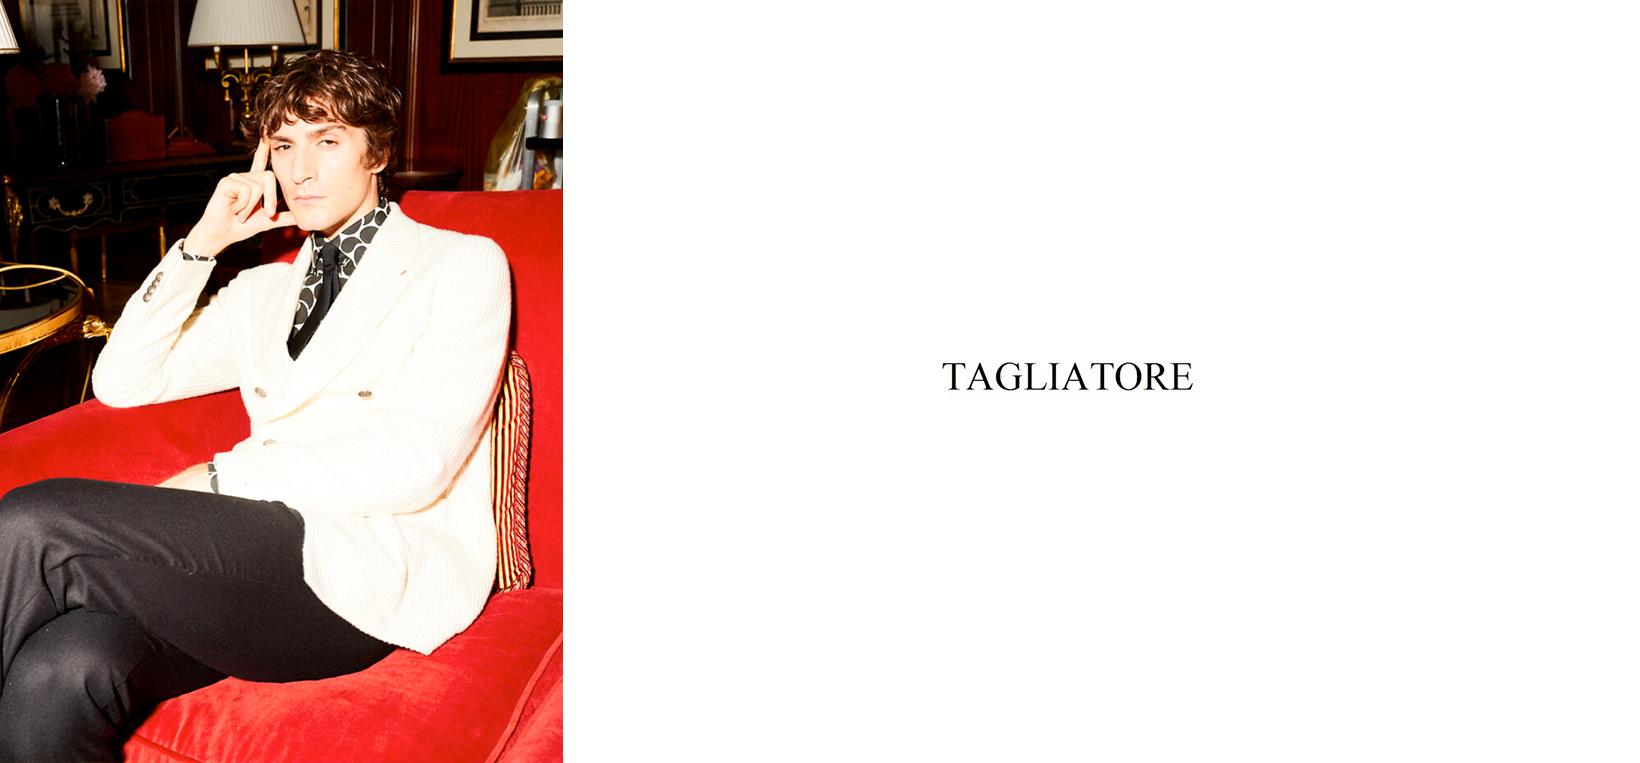 TAGLIATORE - Men - Leam Roma